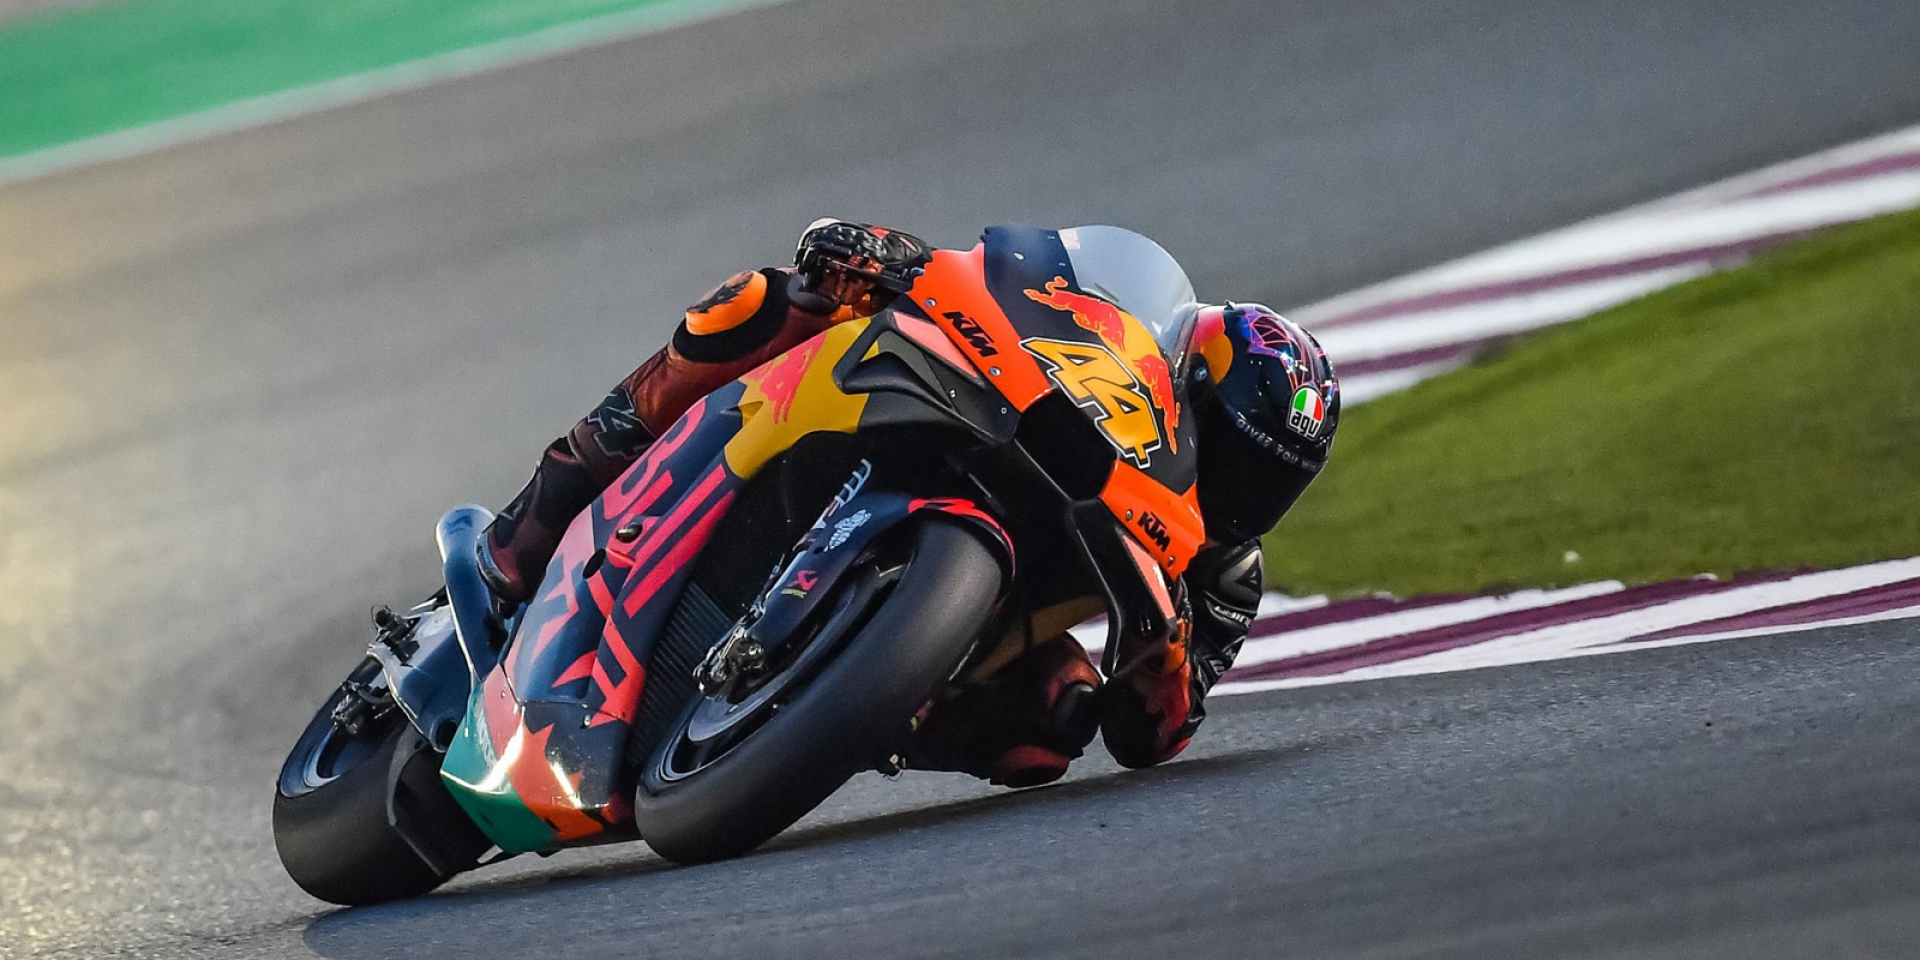 KTM RC16求售中!一千萬就能擁有MotoGP工廠賽車